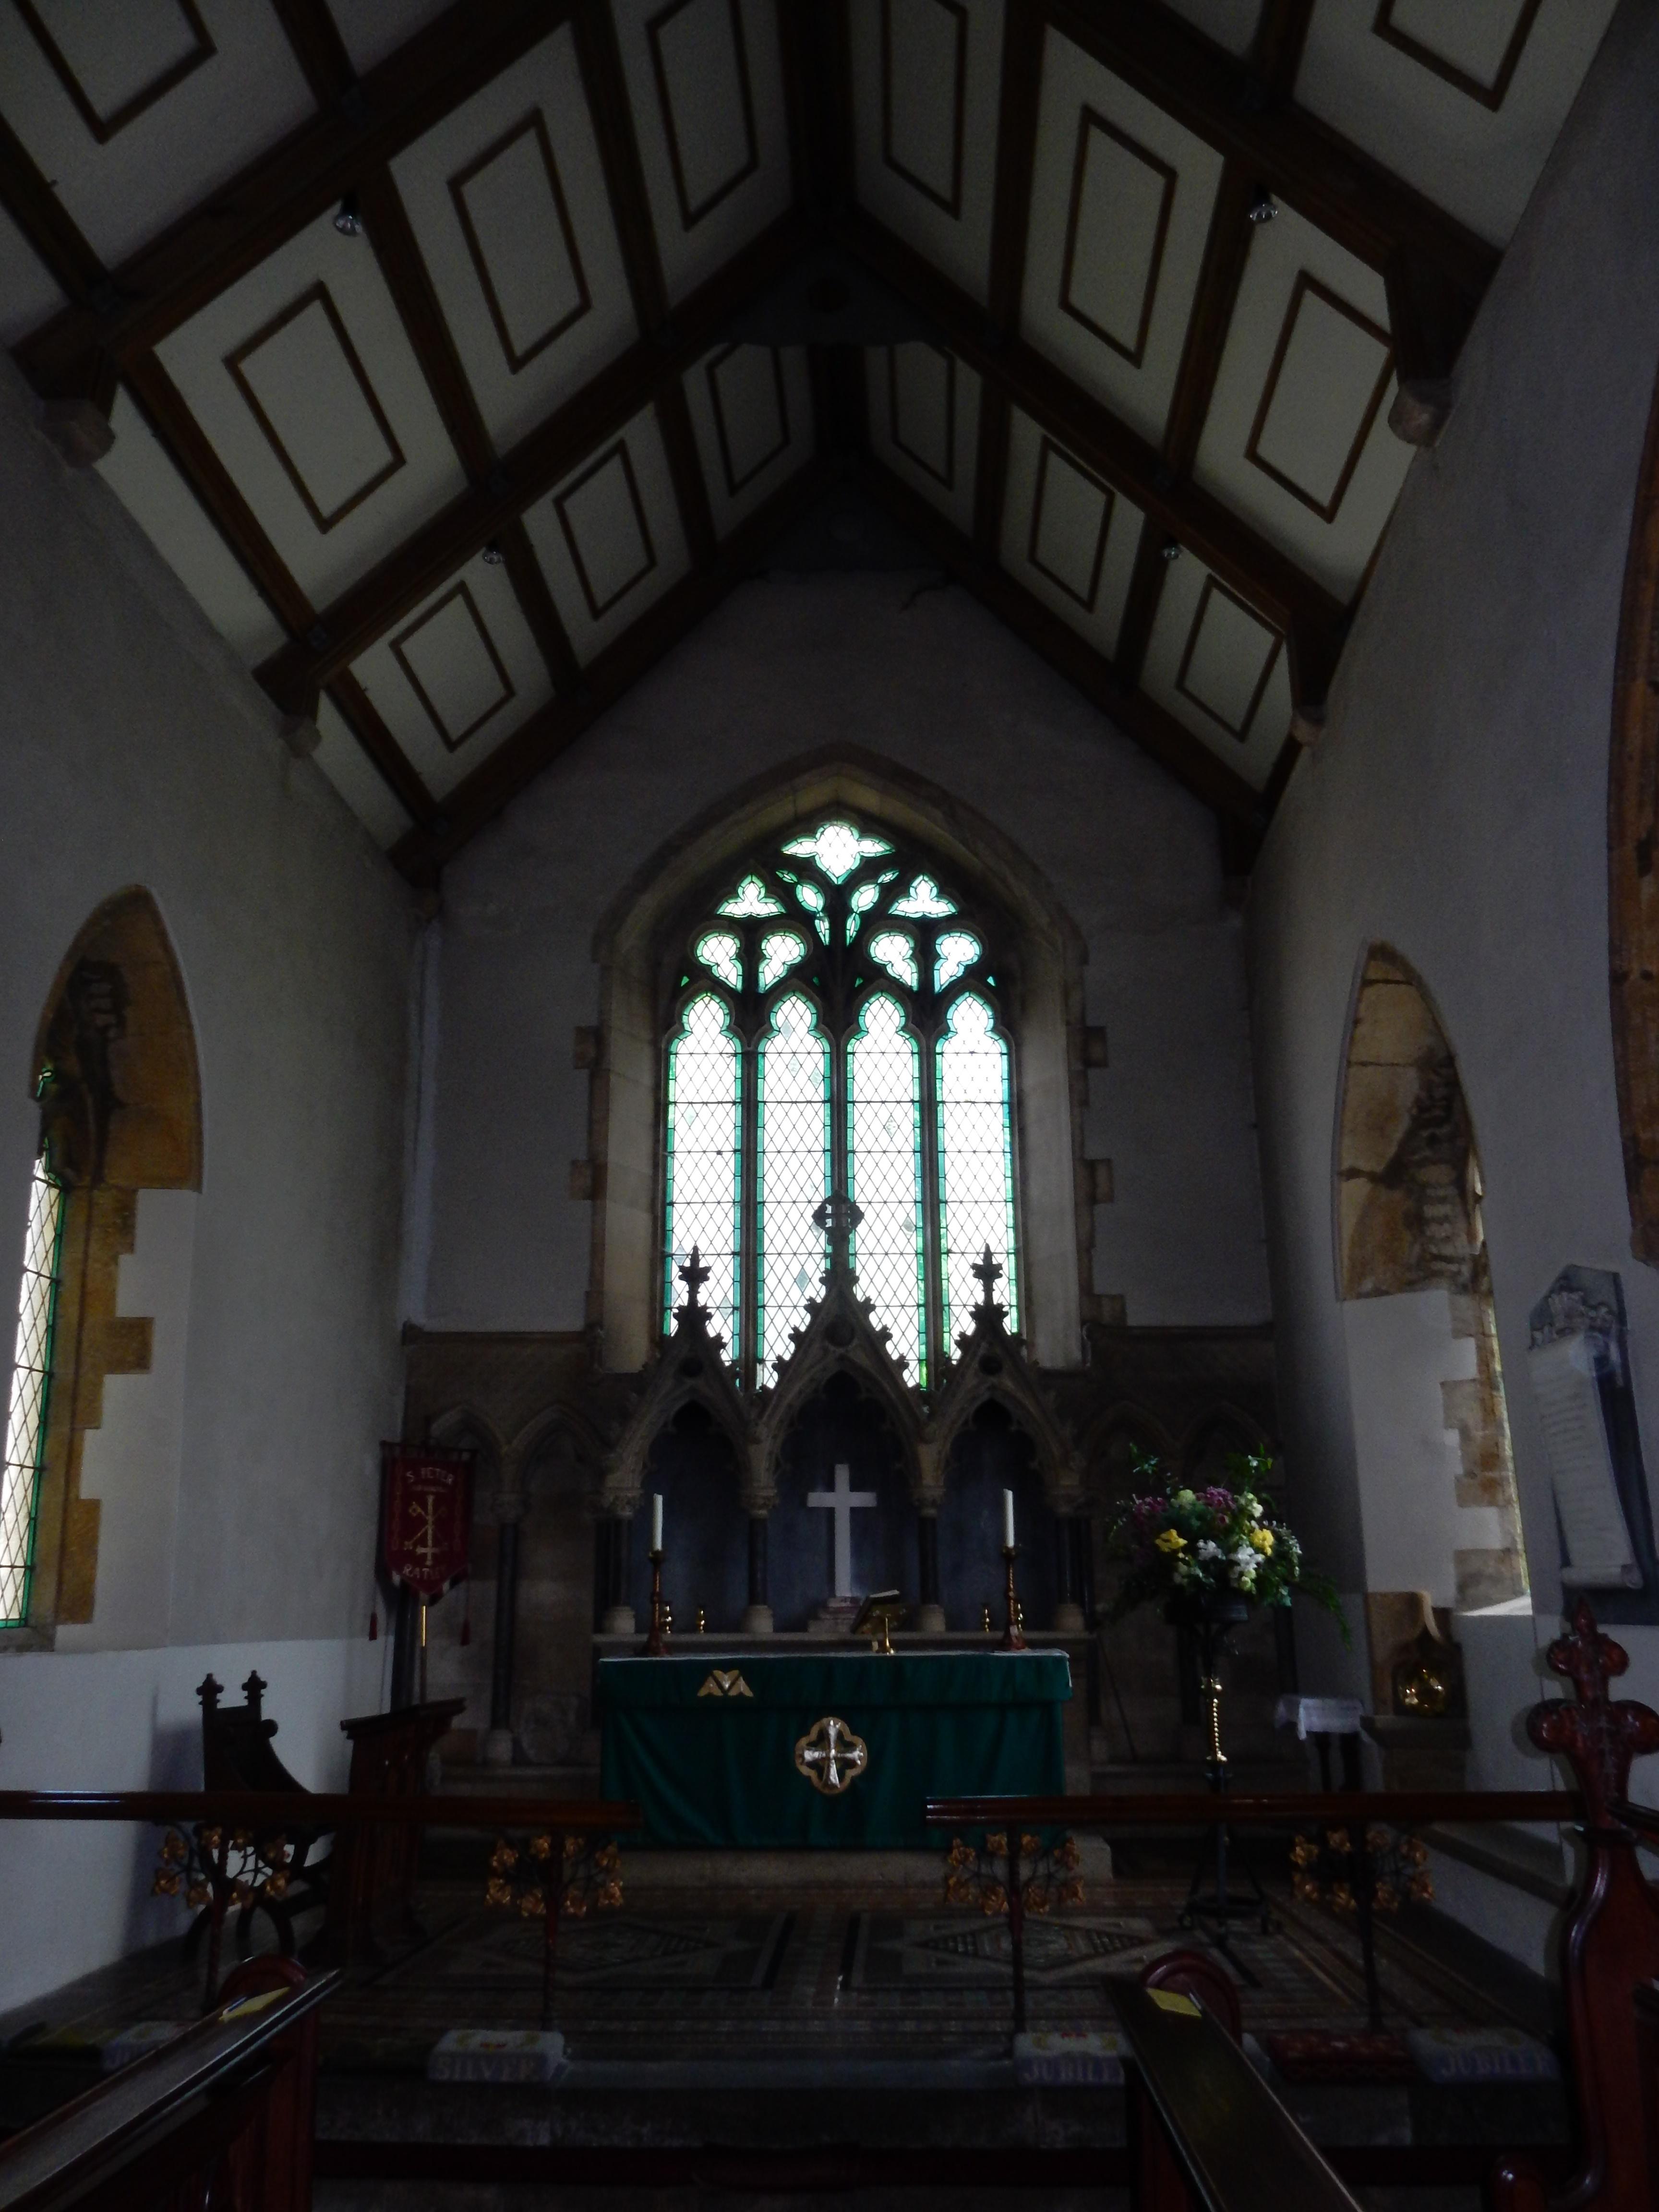 Ratley St Peter ad Vincula church (credit St Peter ad Vincula)